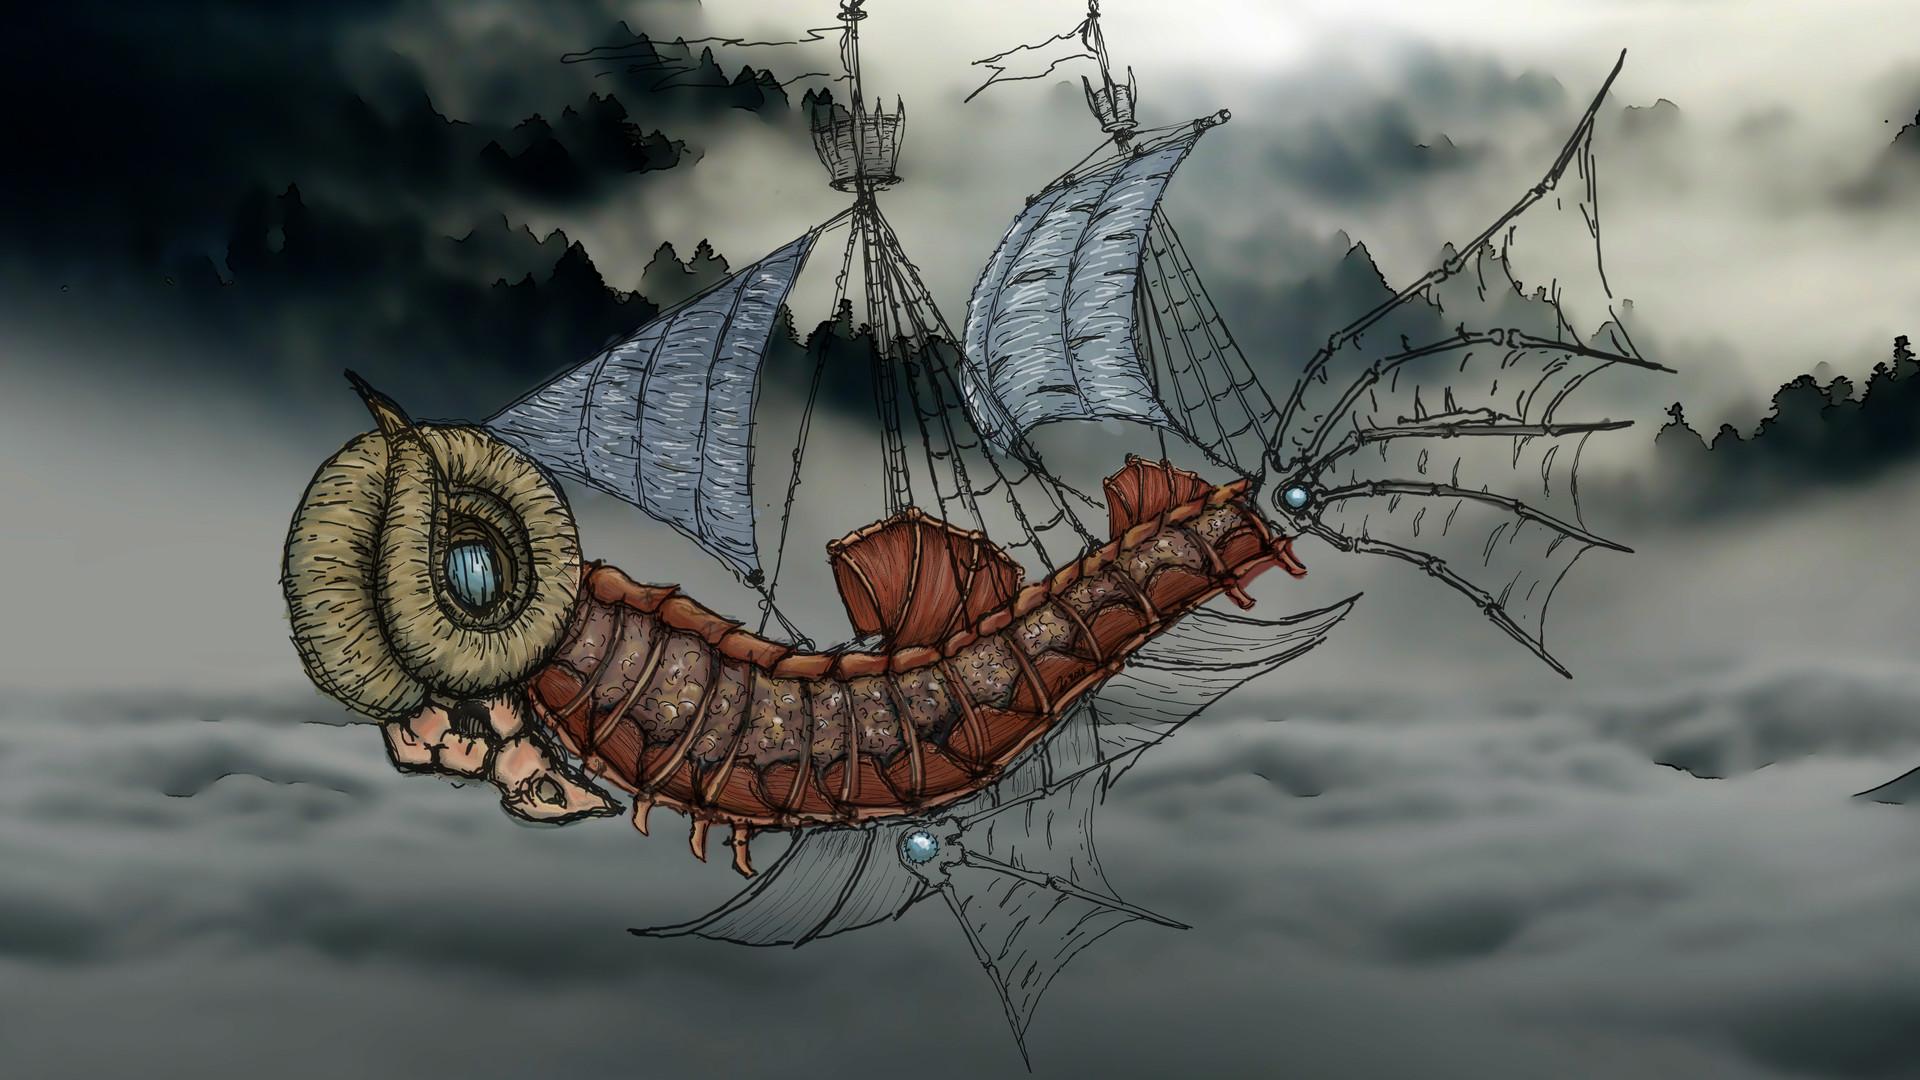 Arcadeous phoenix aries charon frigate 1b